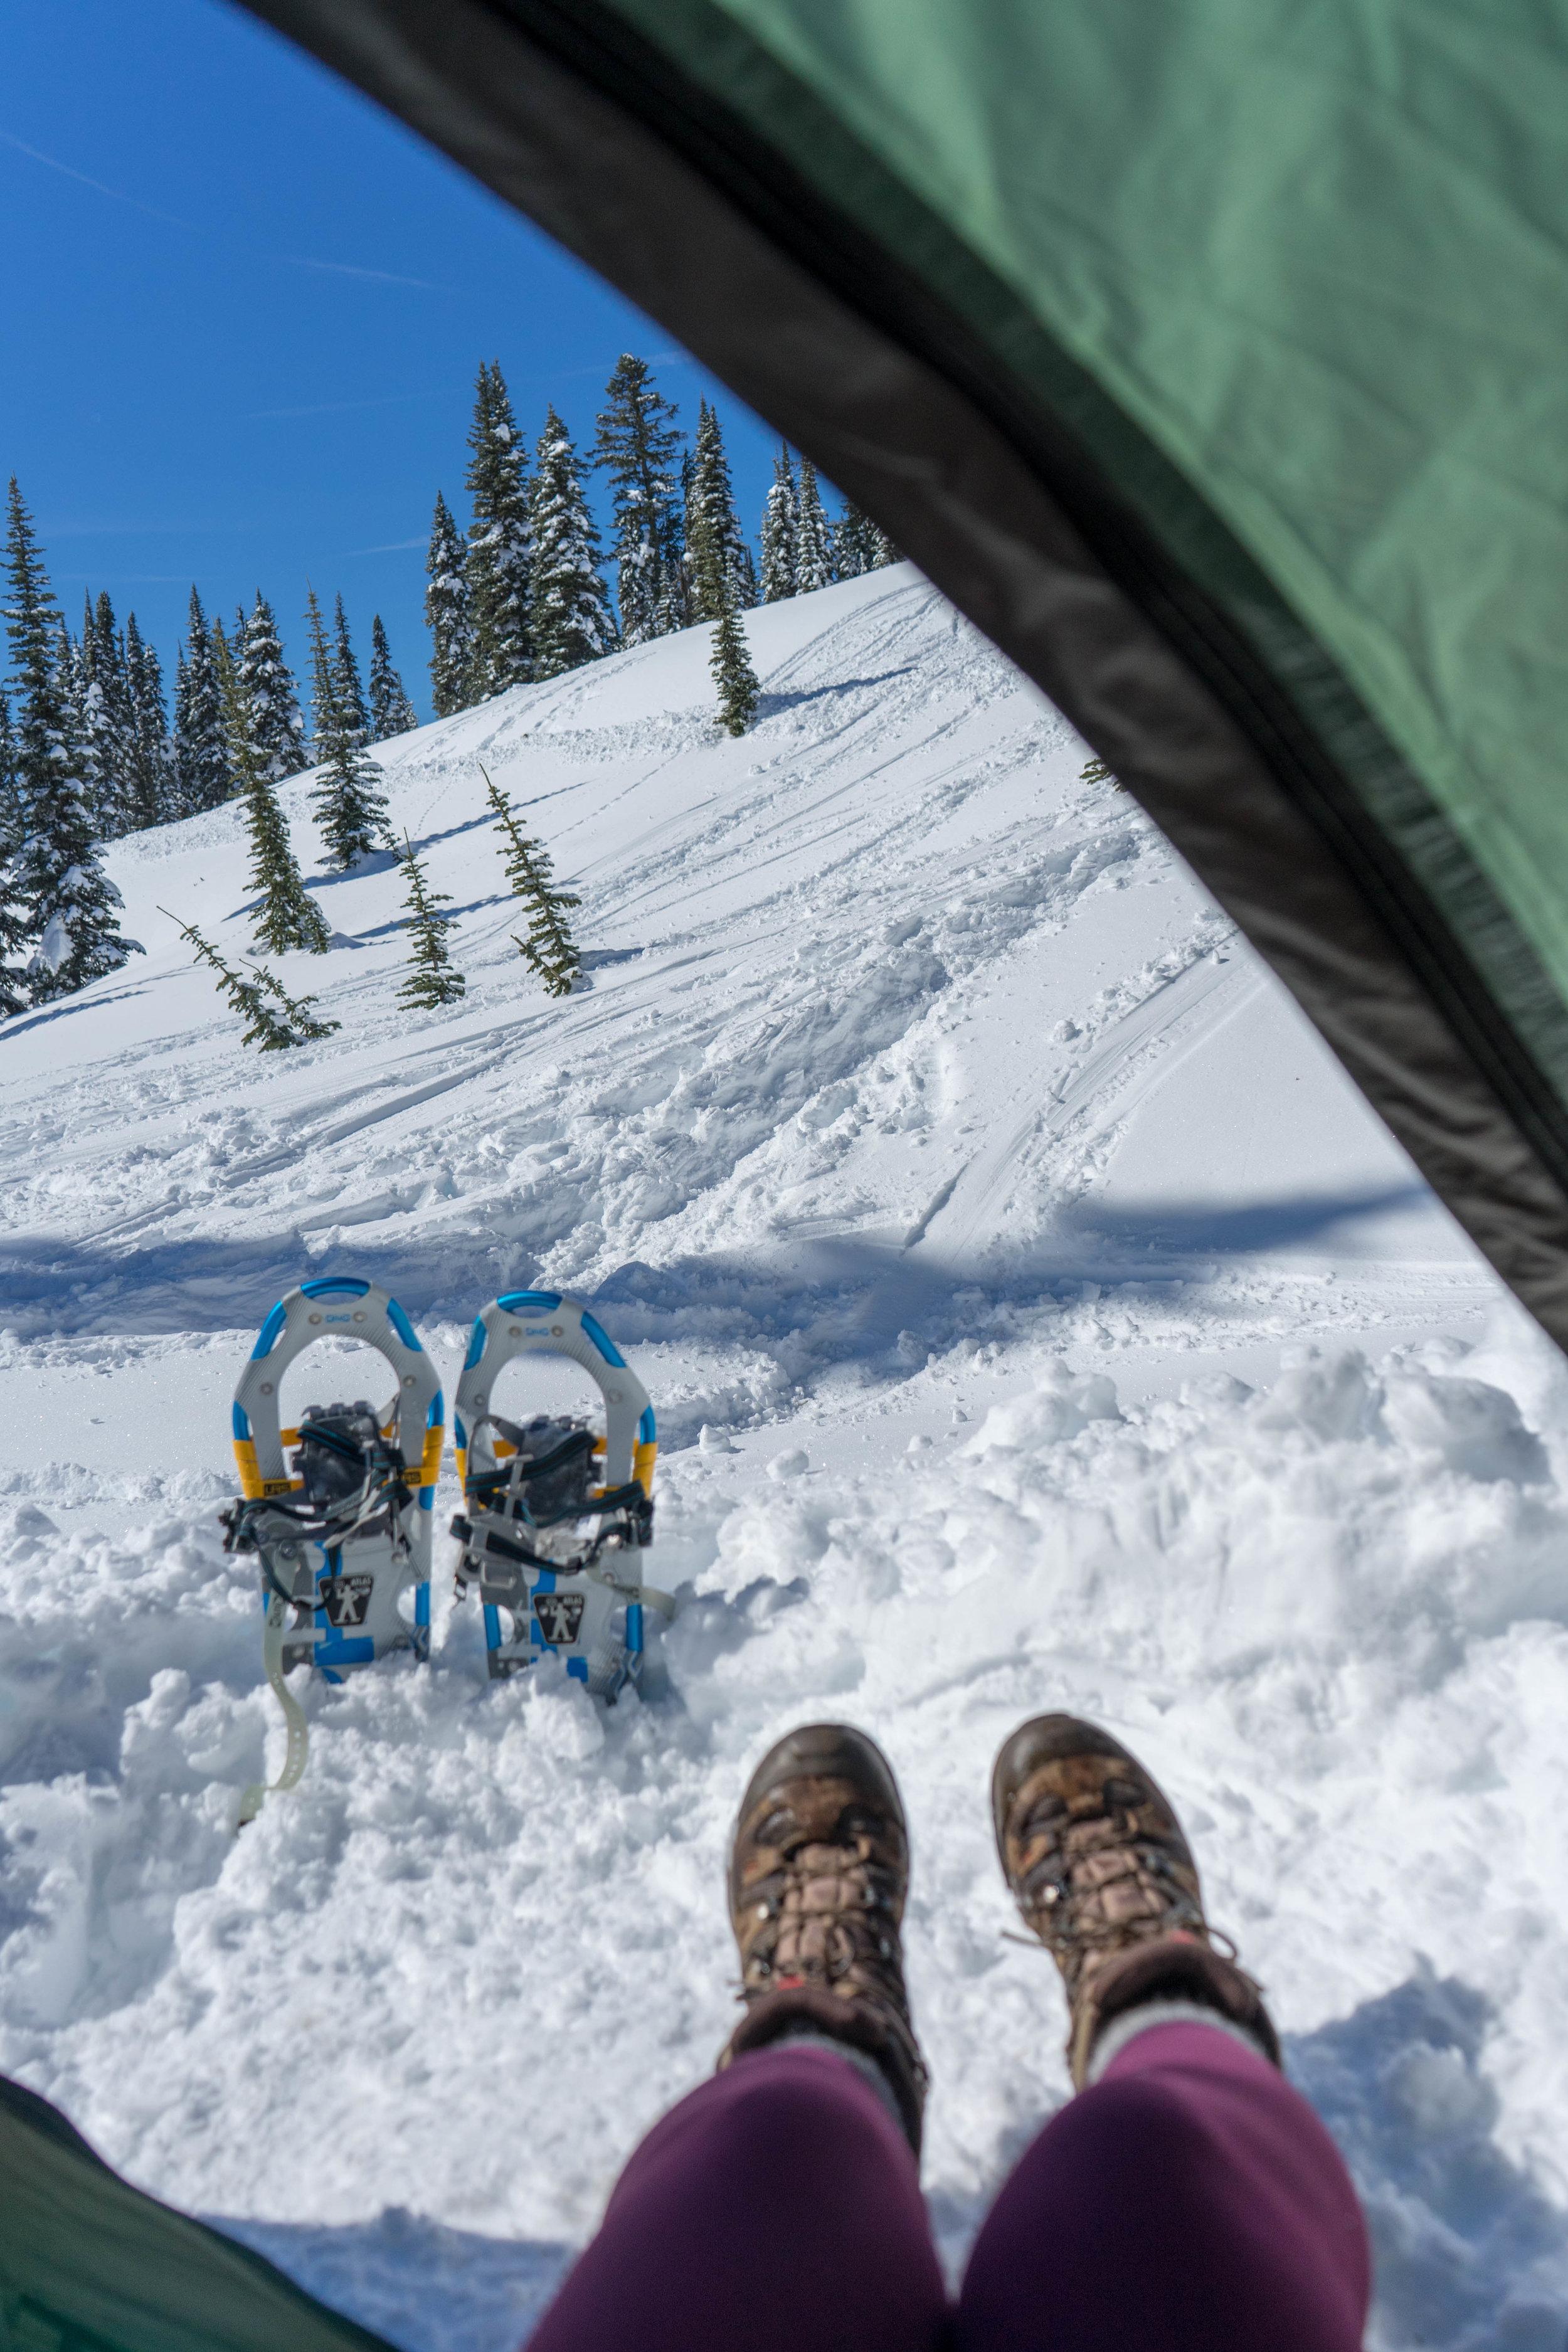 Snow-Camping-at-Mount-Rainier-National-Park-13.jpg